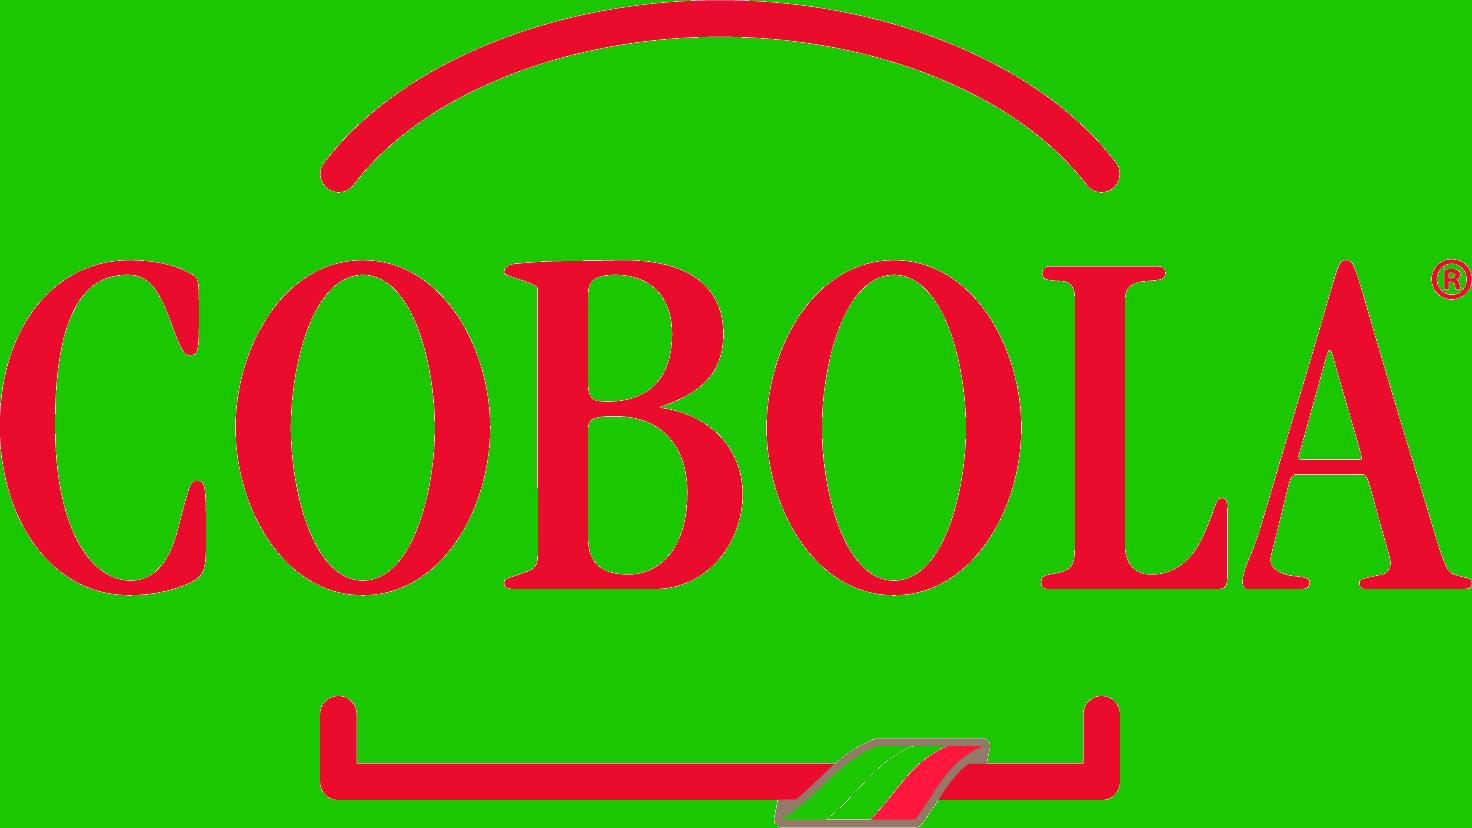 Cobola